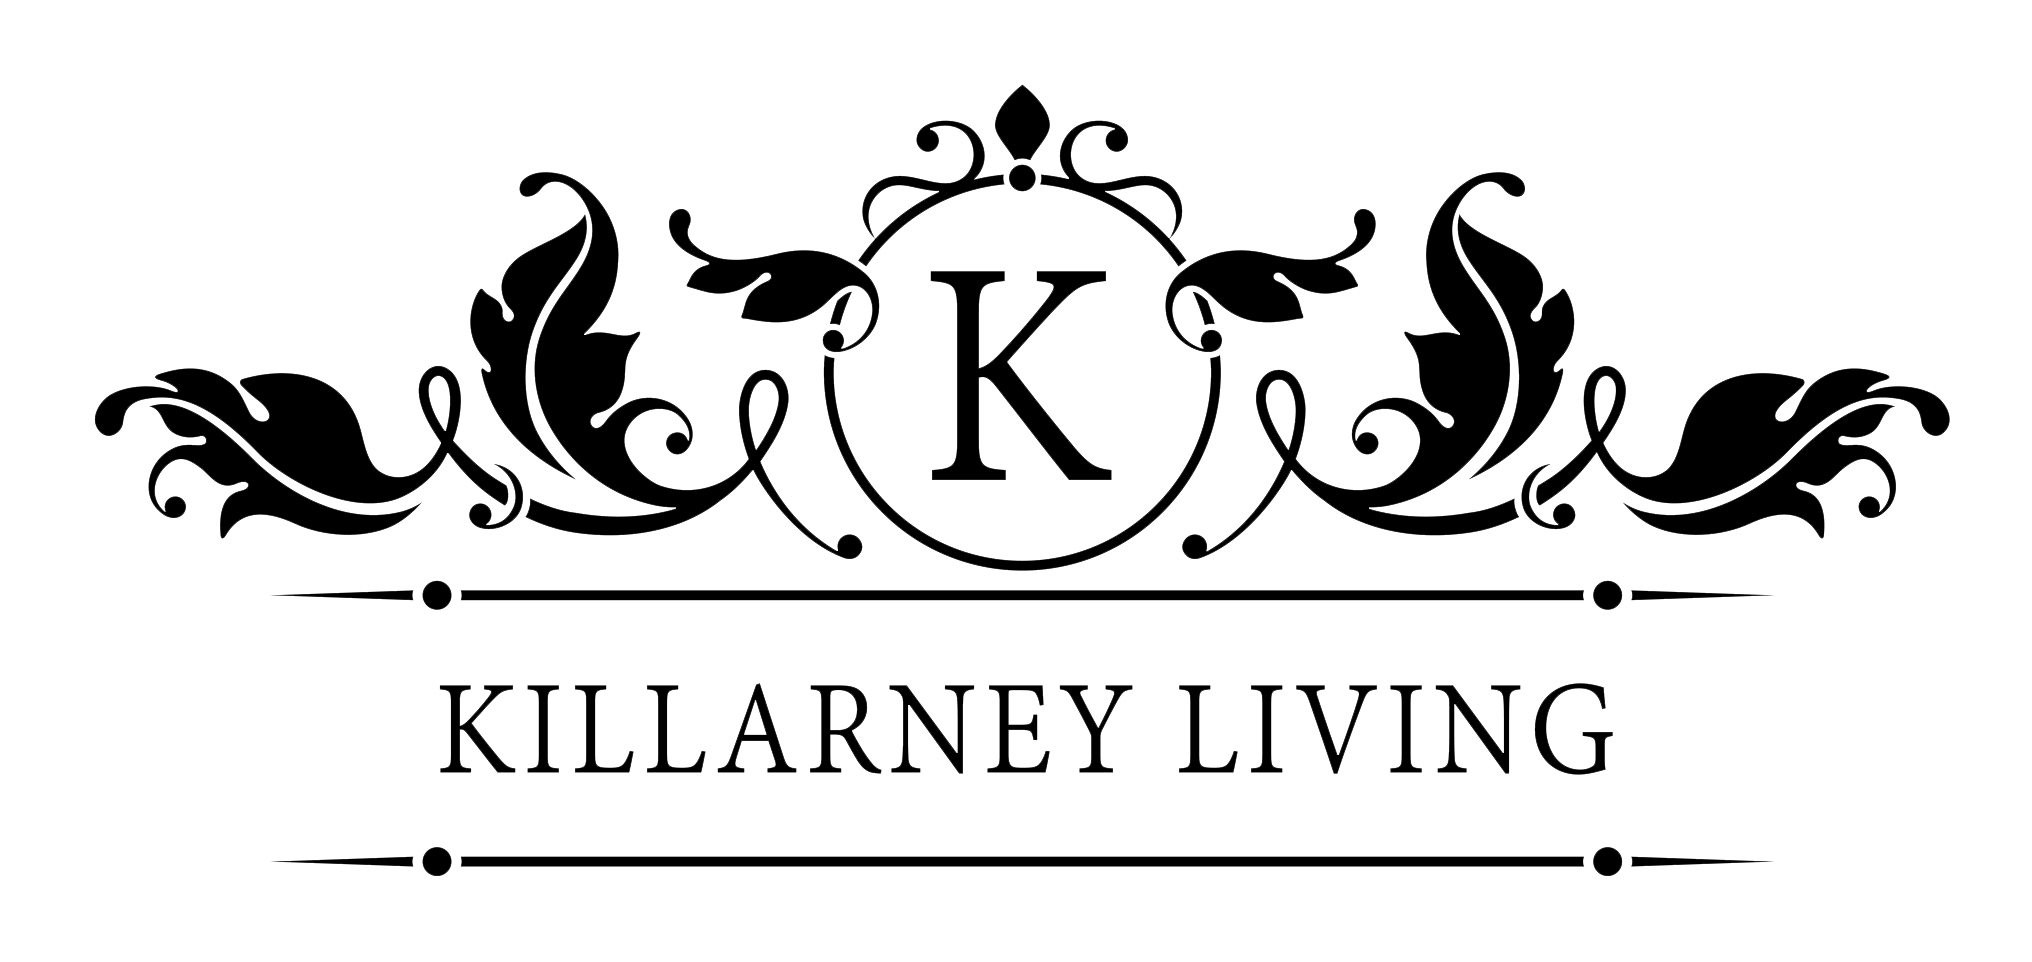 Killarney Living